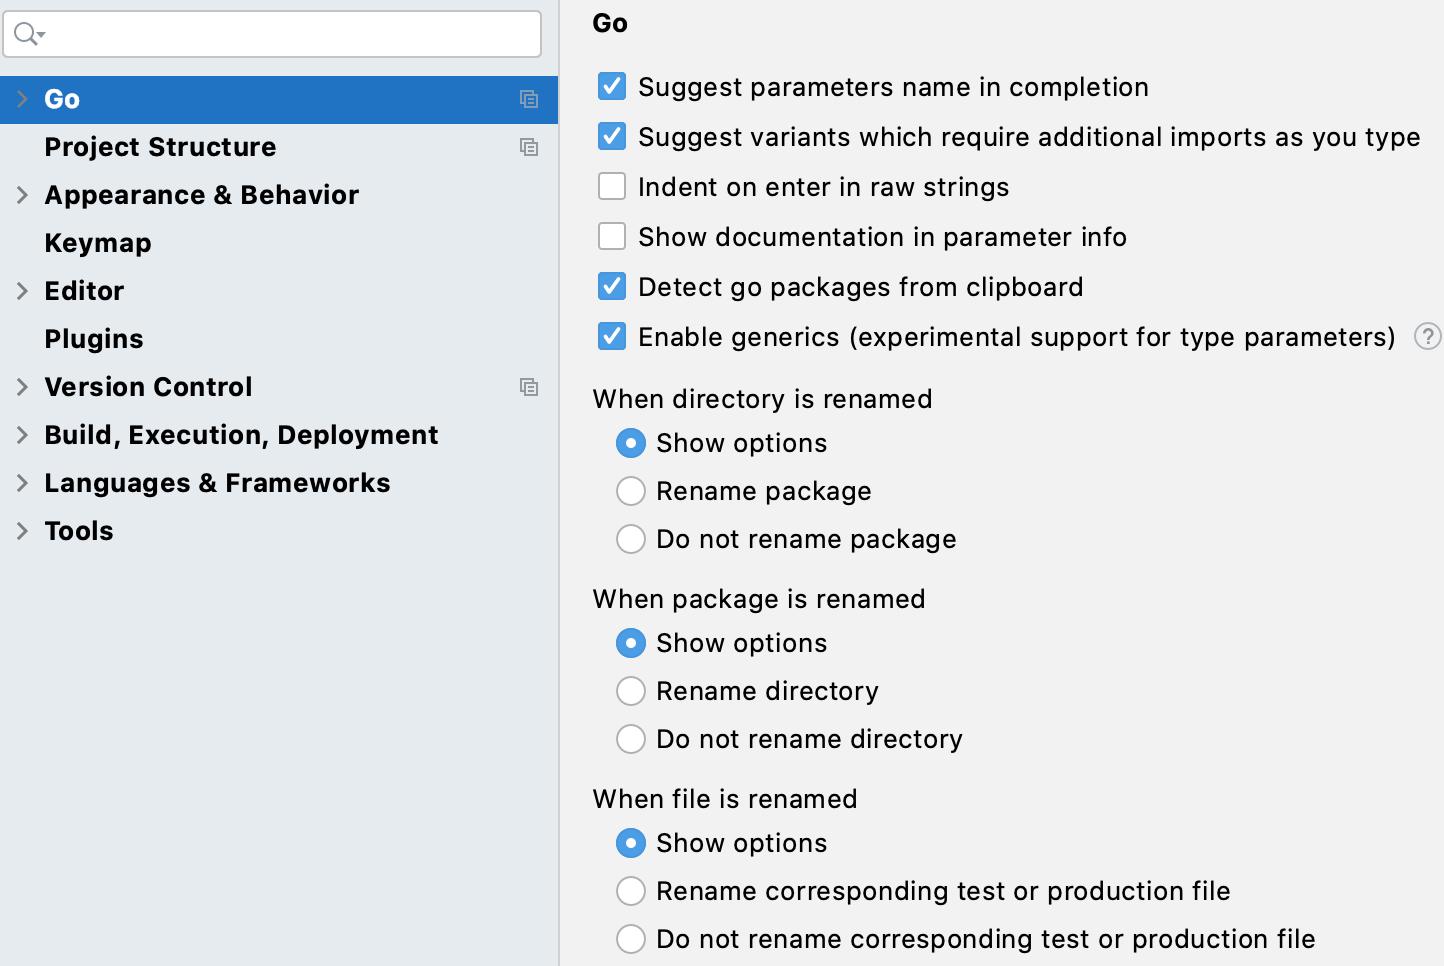 General settings for go